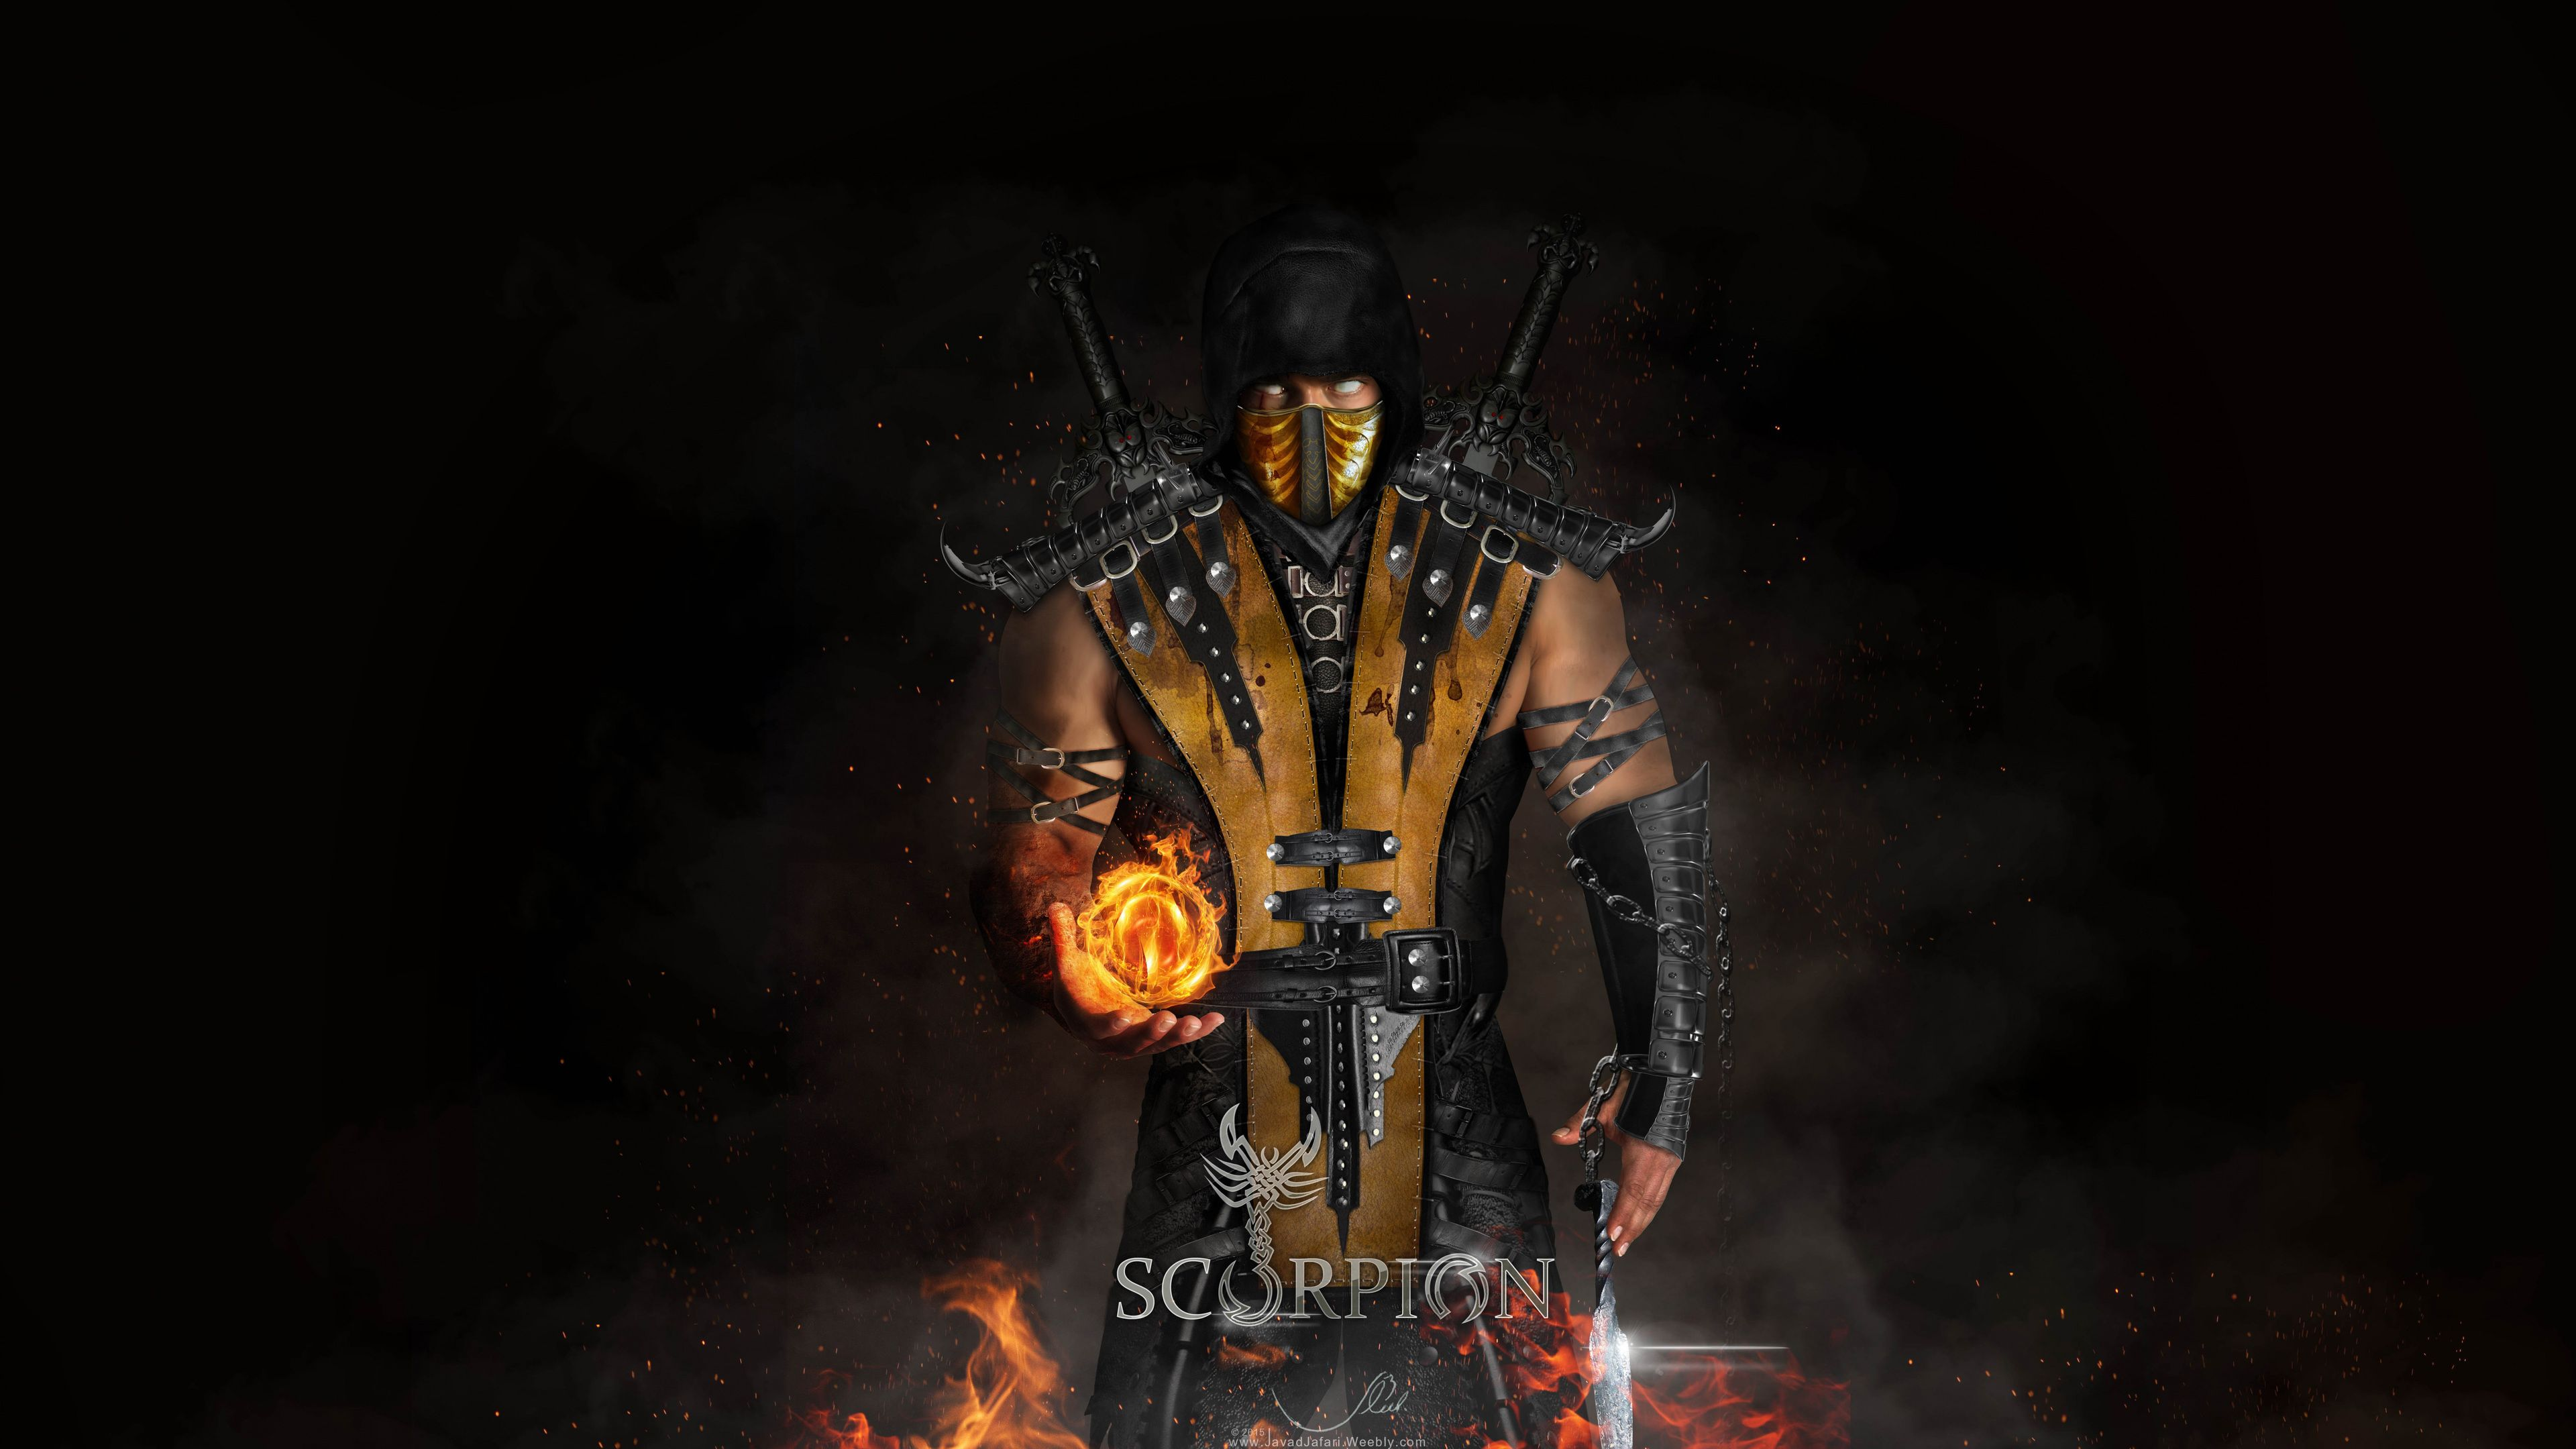 Scorpion Mortal Kombat X 4k Xbox Games Wallpapers Ps Games Wallpapers Pc Games Wallpapers Mo Scorpion Mortal Kombat Mortal Kombat X Scorpion Mortal Kombat X